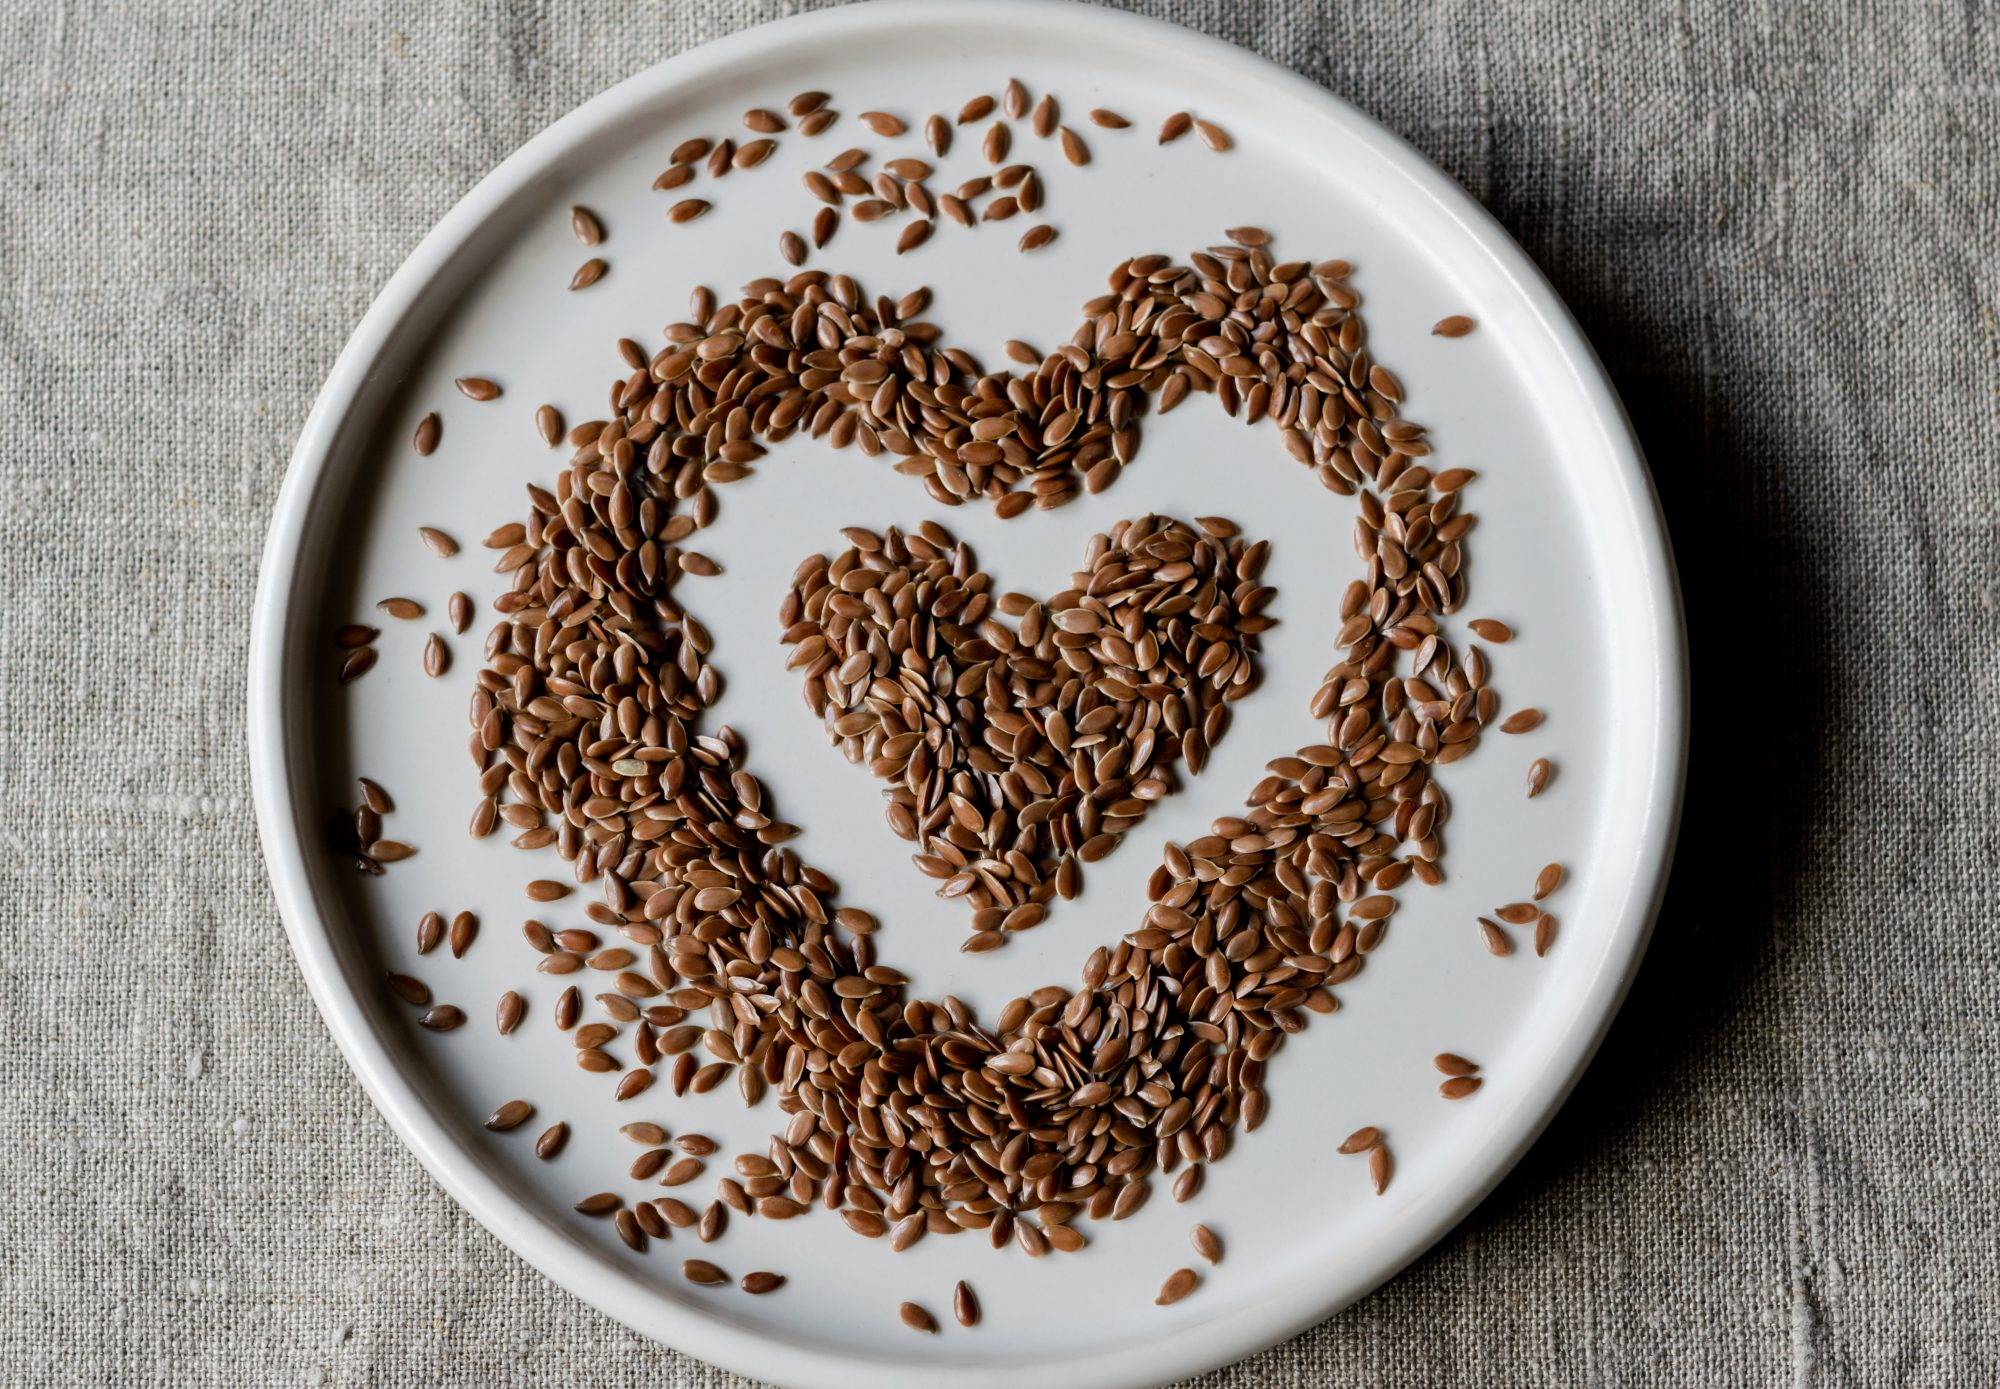 Flax seeds Getty 3/23/20